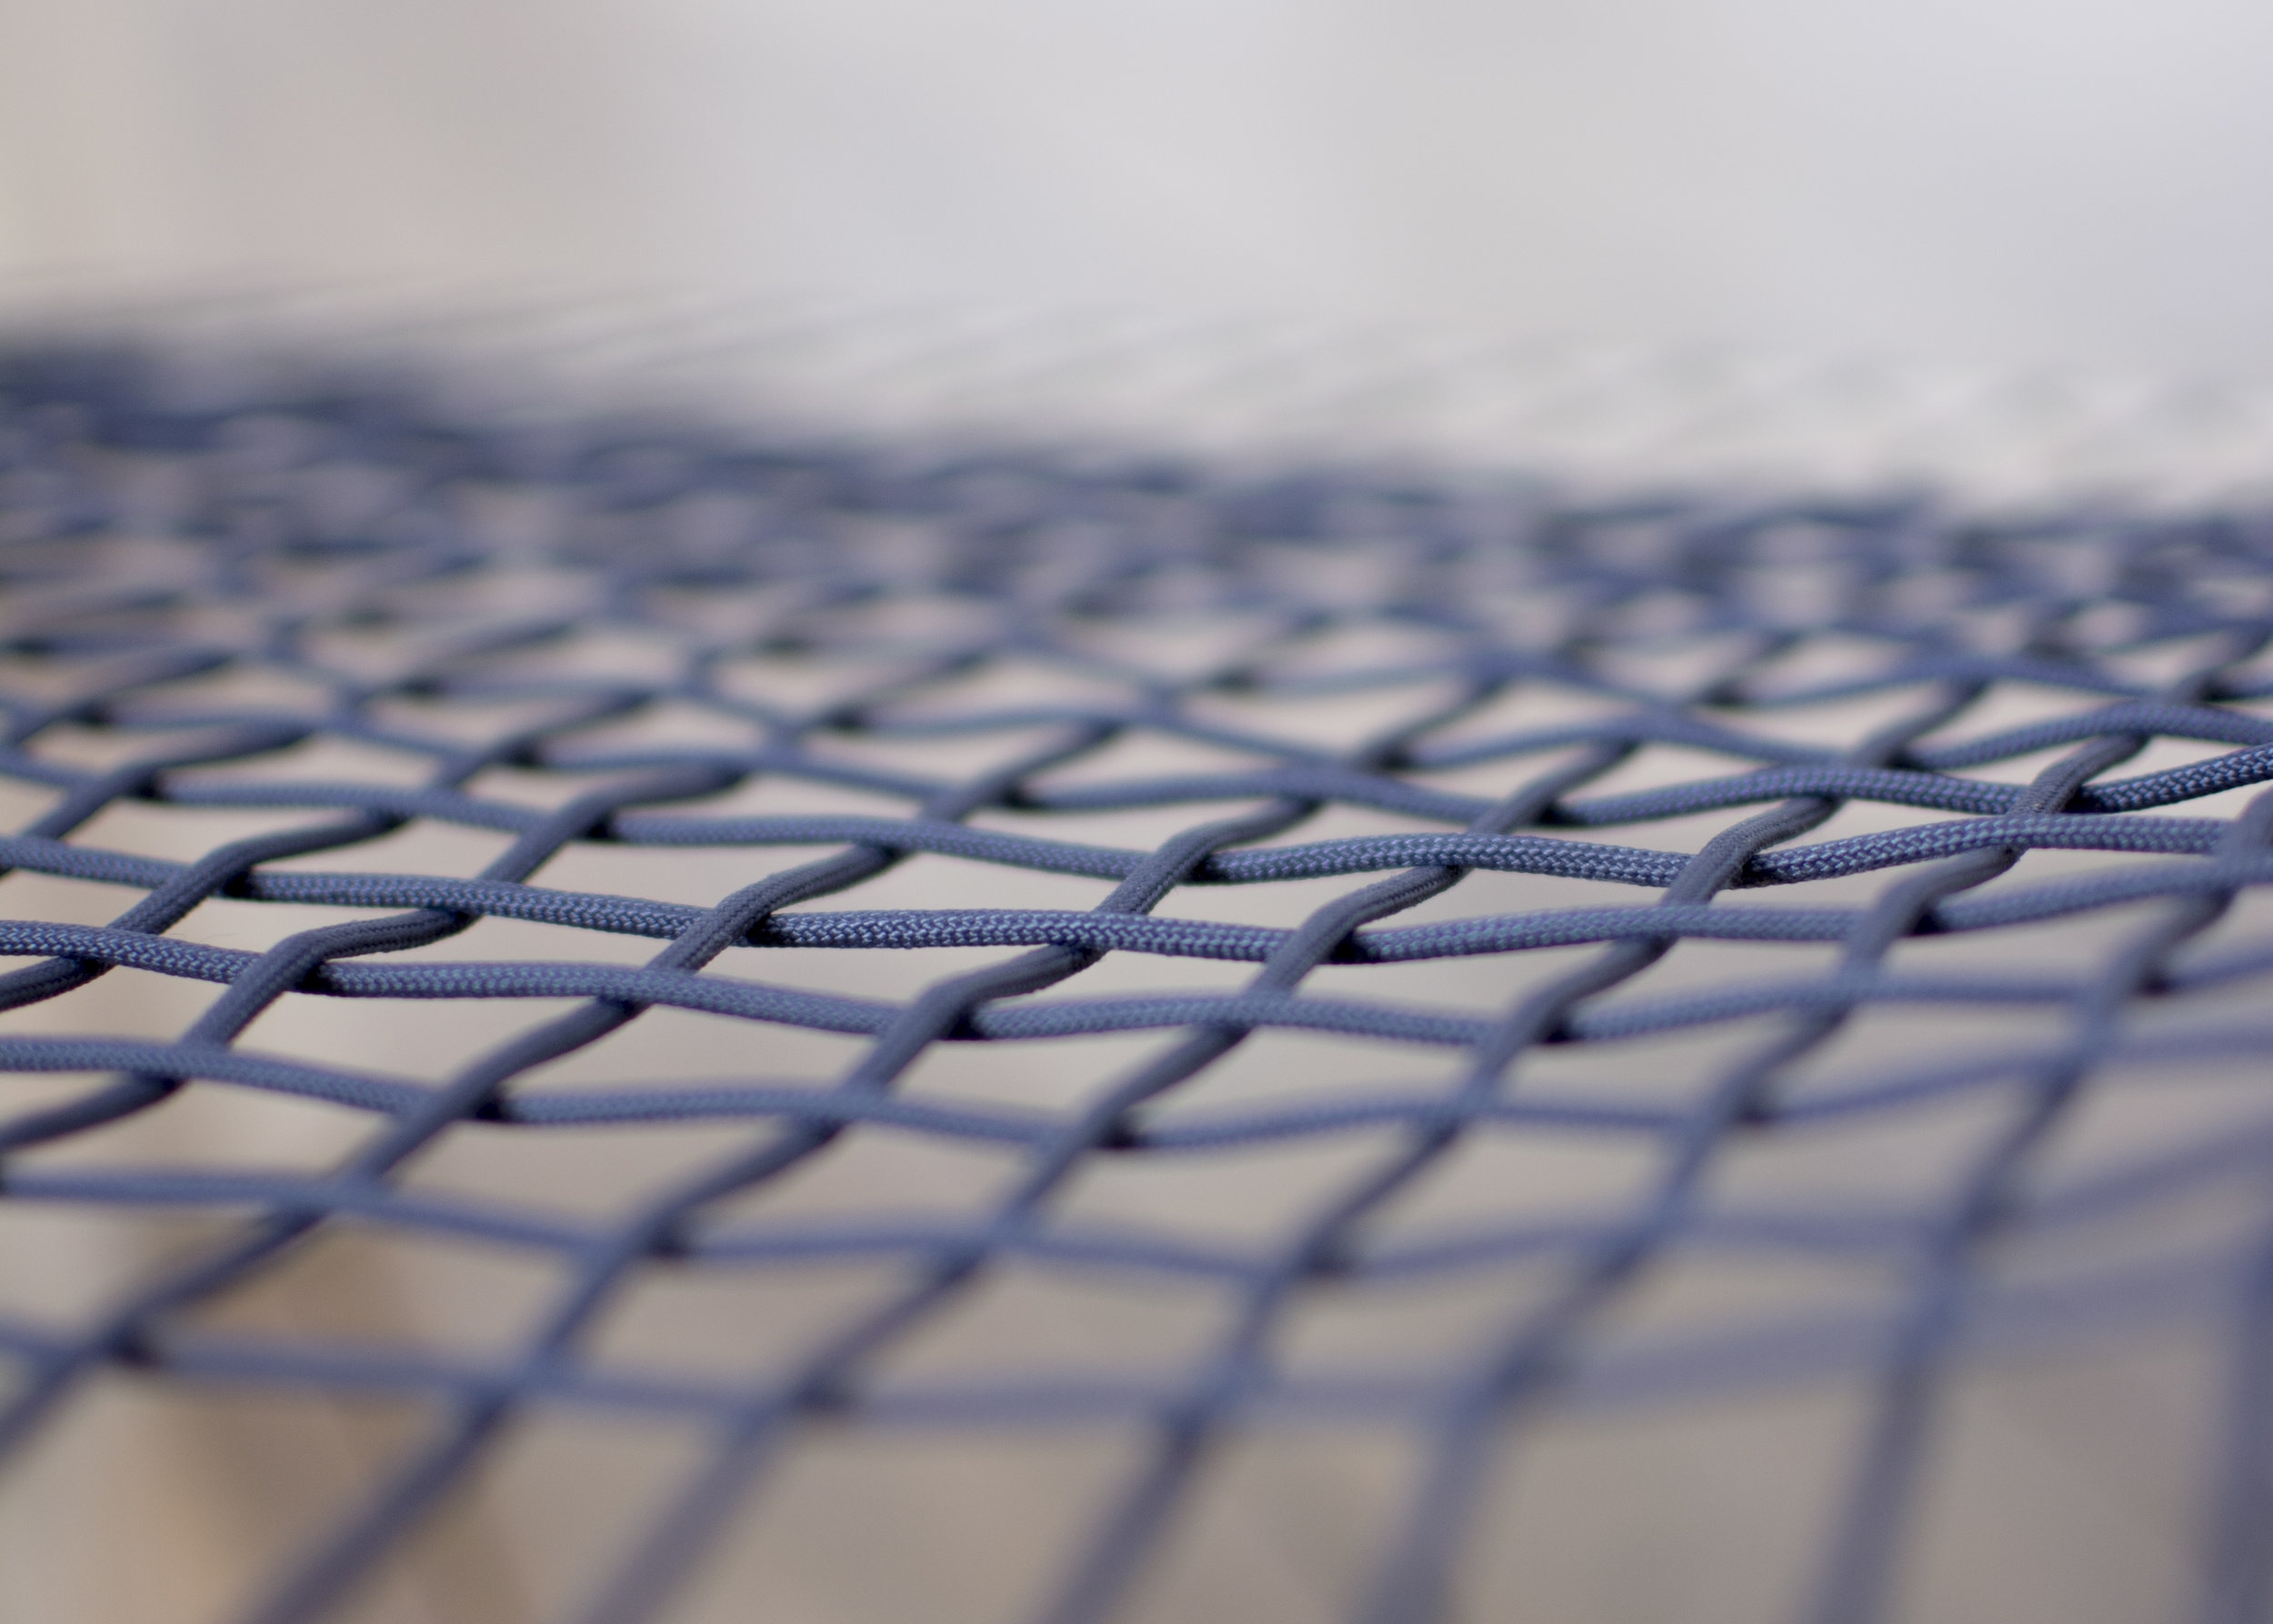 Navnløs - Furniture Design in Scandinavia